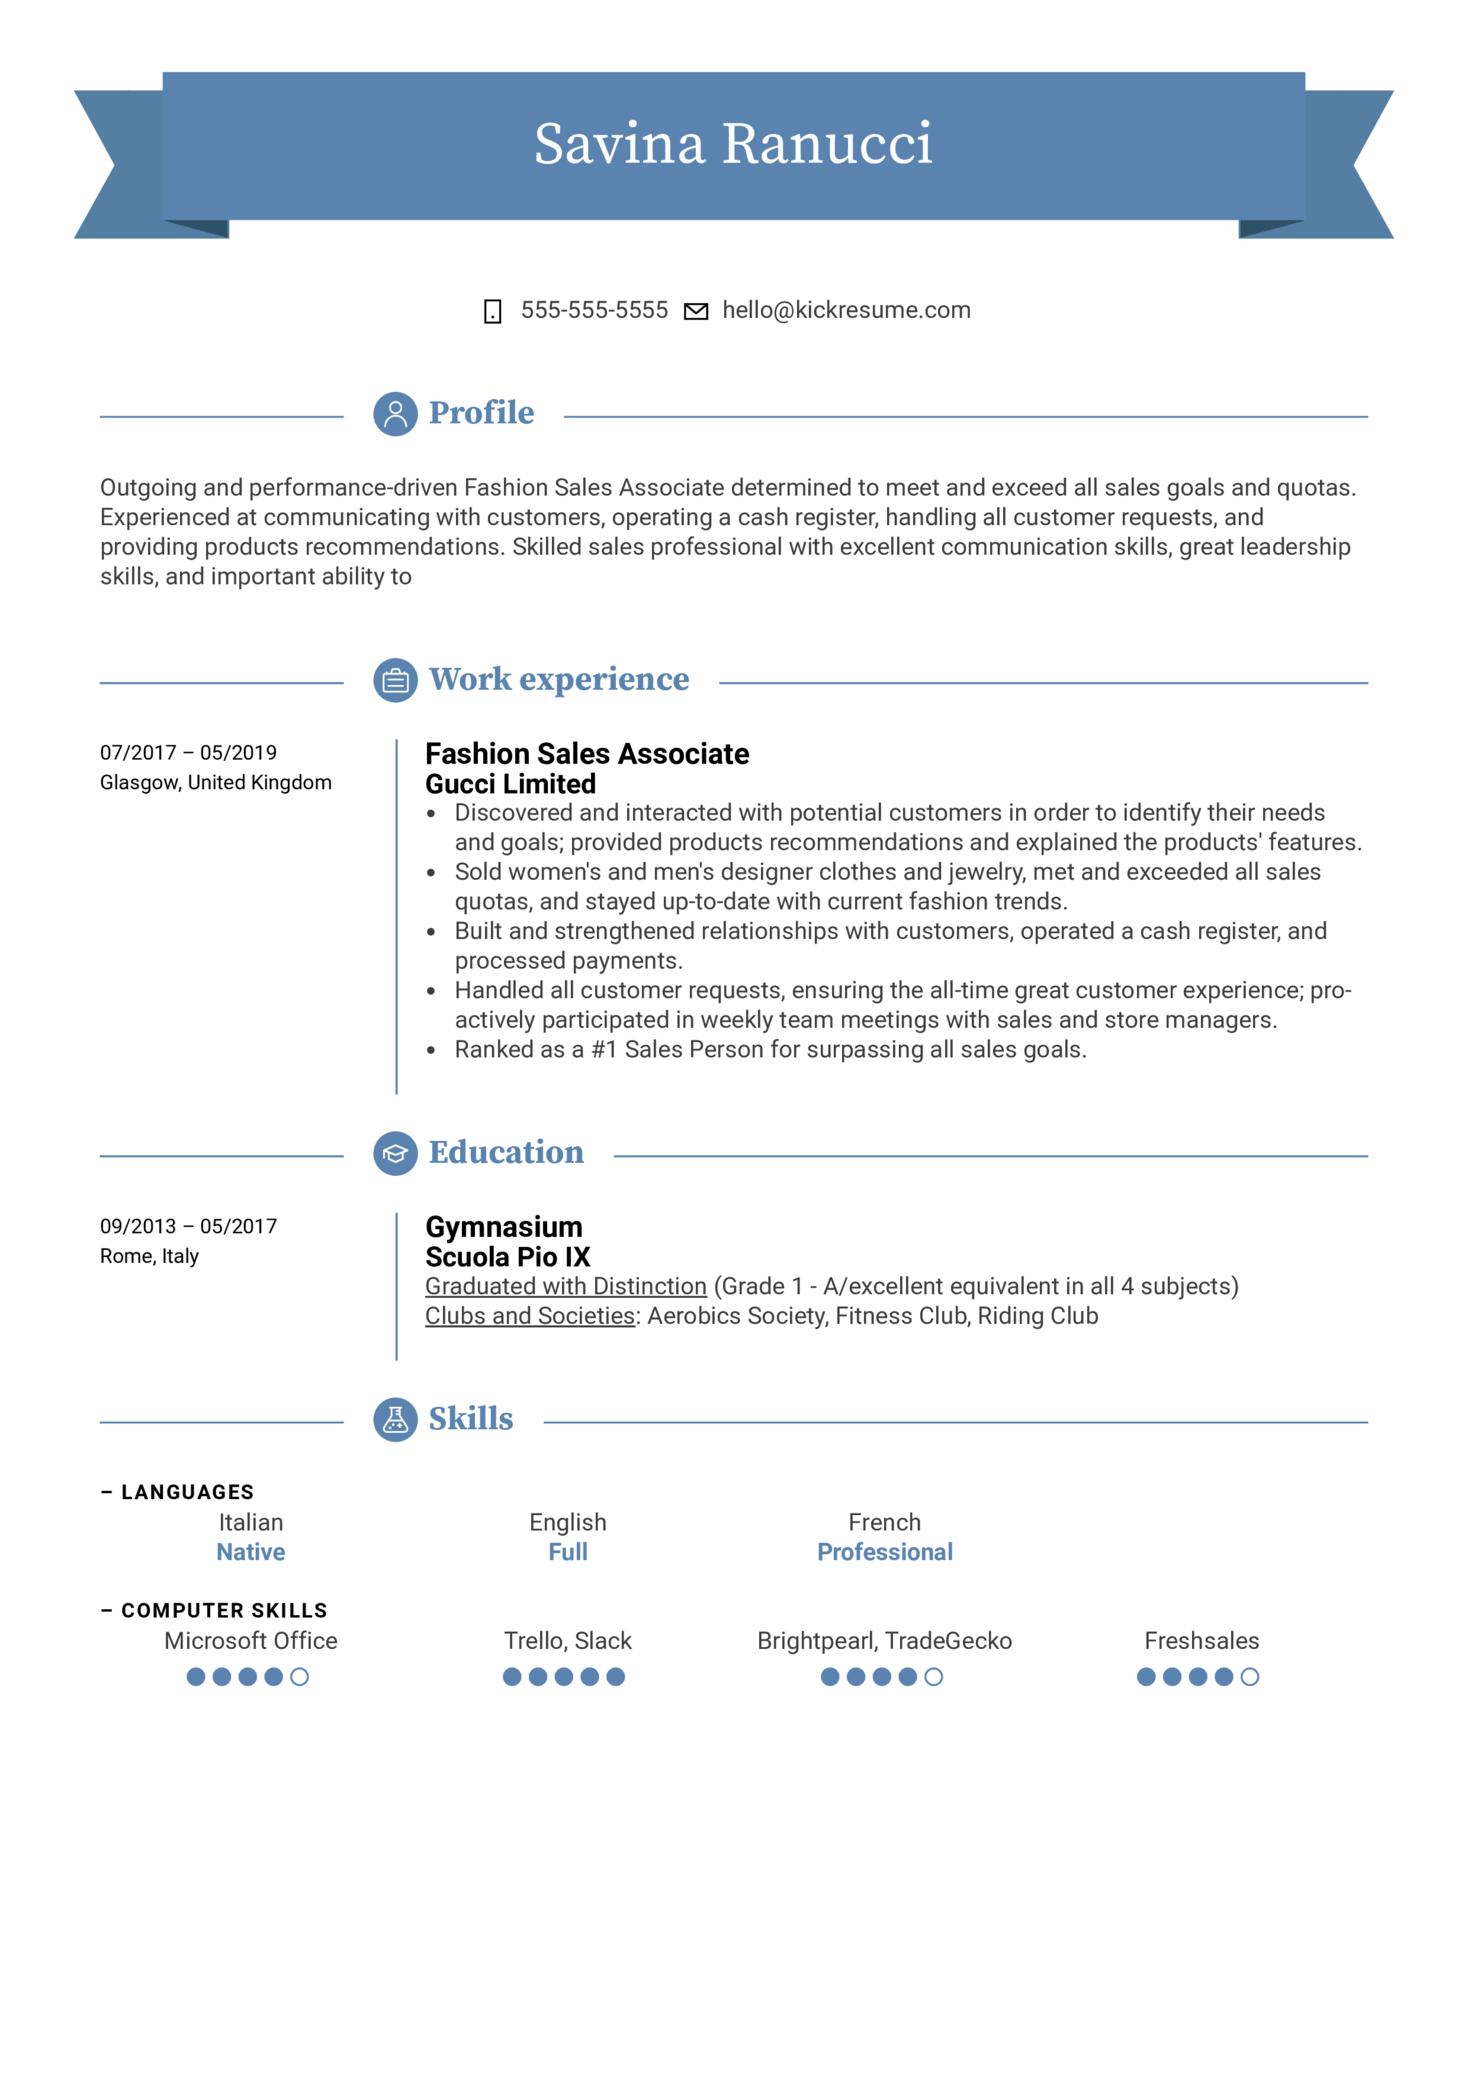 Fashion Sales Associate Resume Example (parte 1)